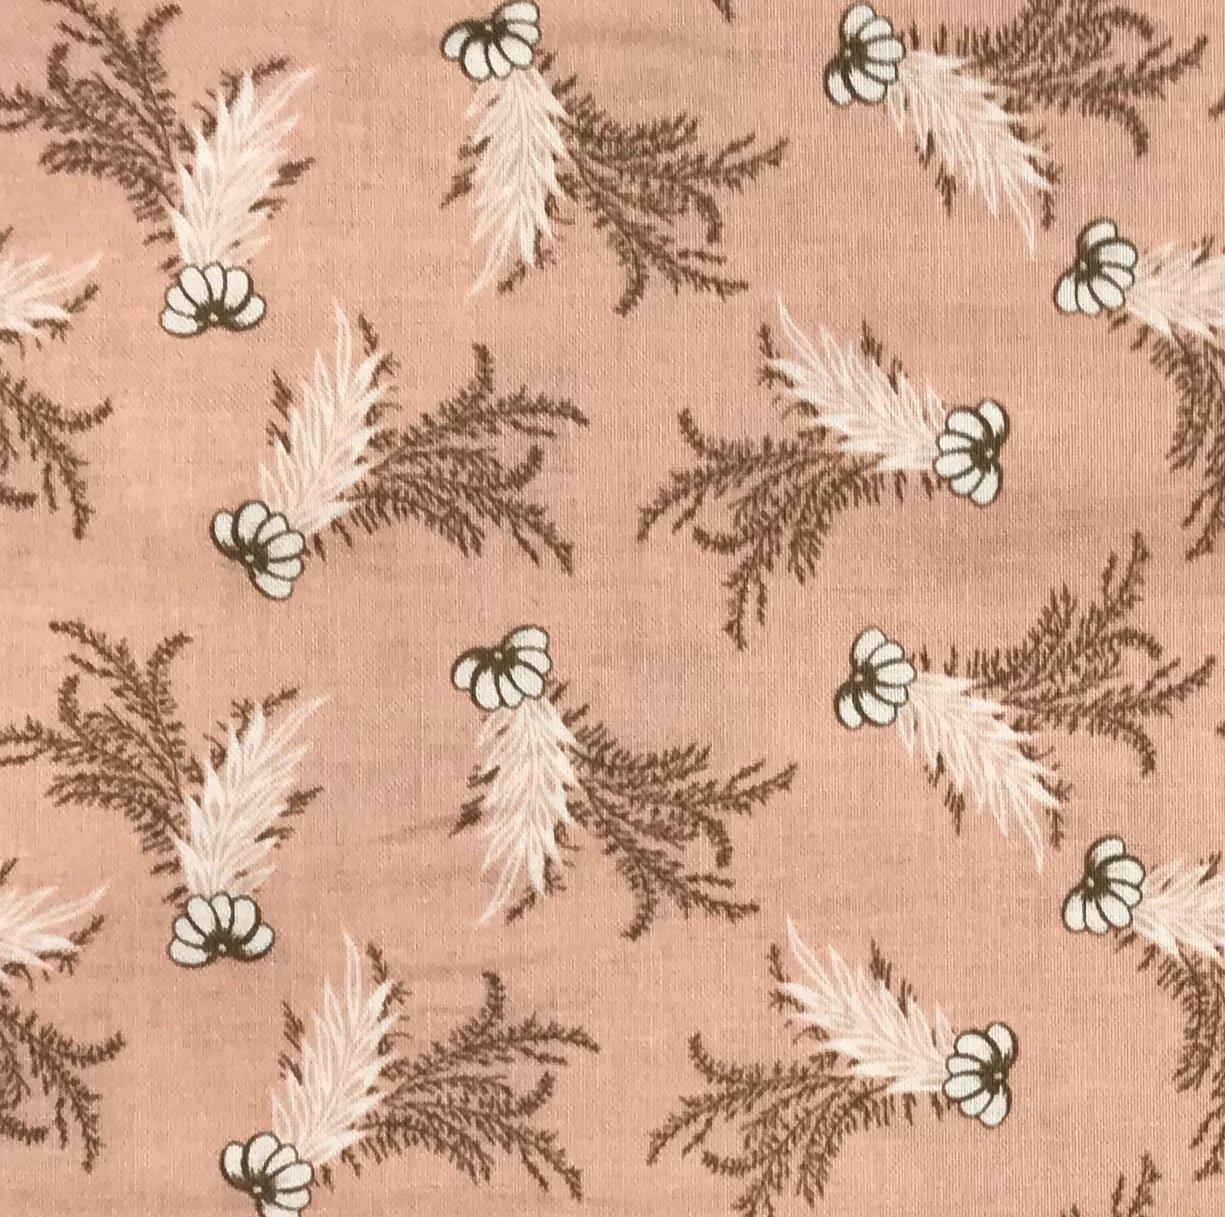 Feathers on Blush - Era of Jane Collection